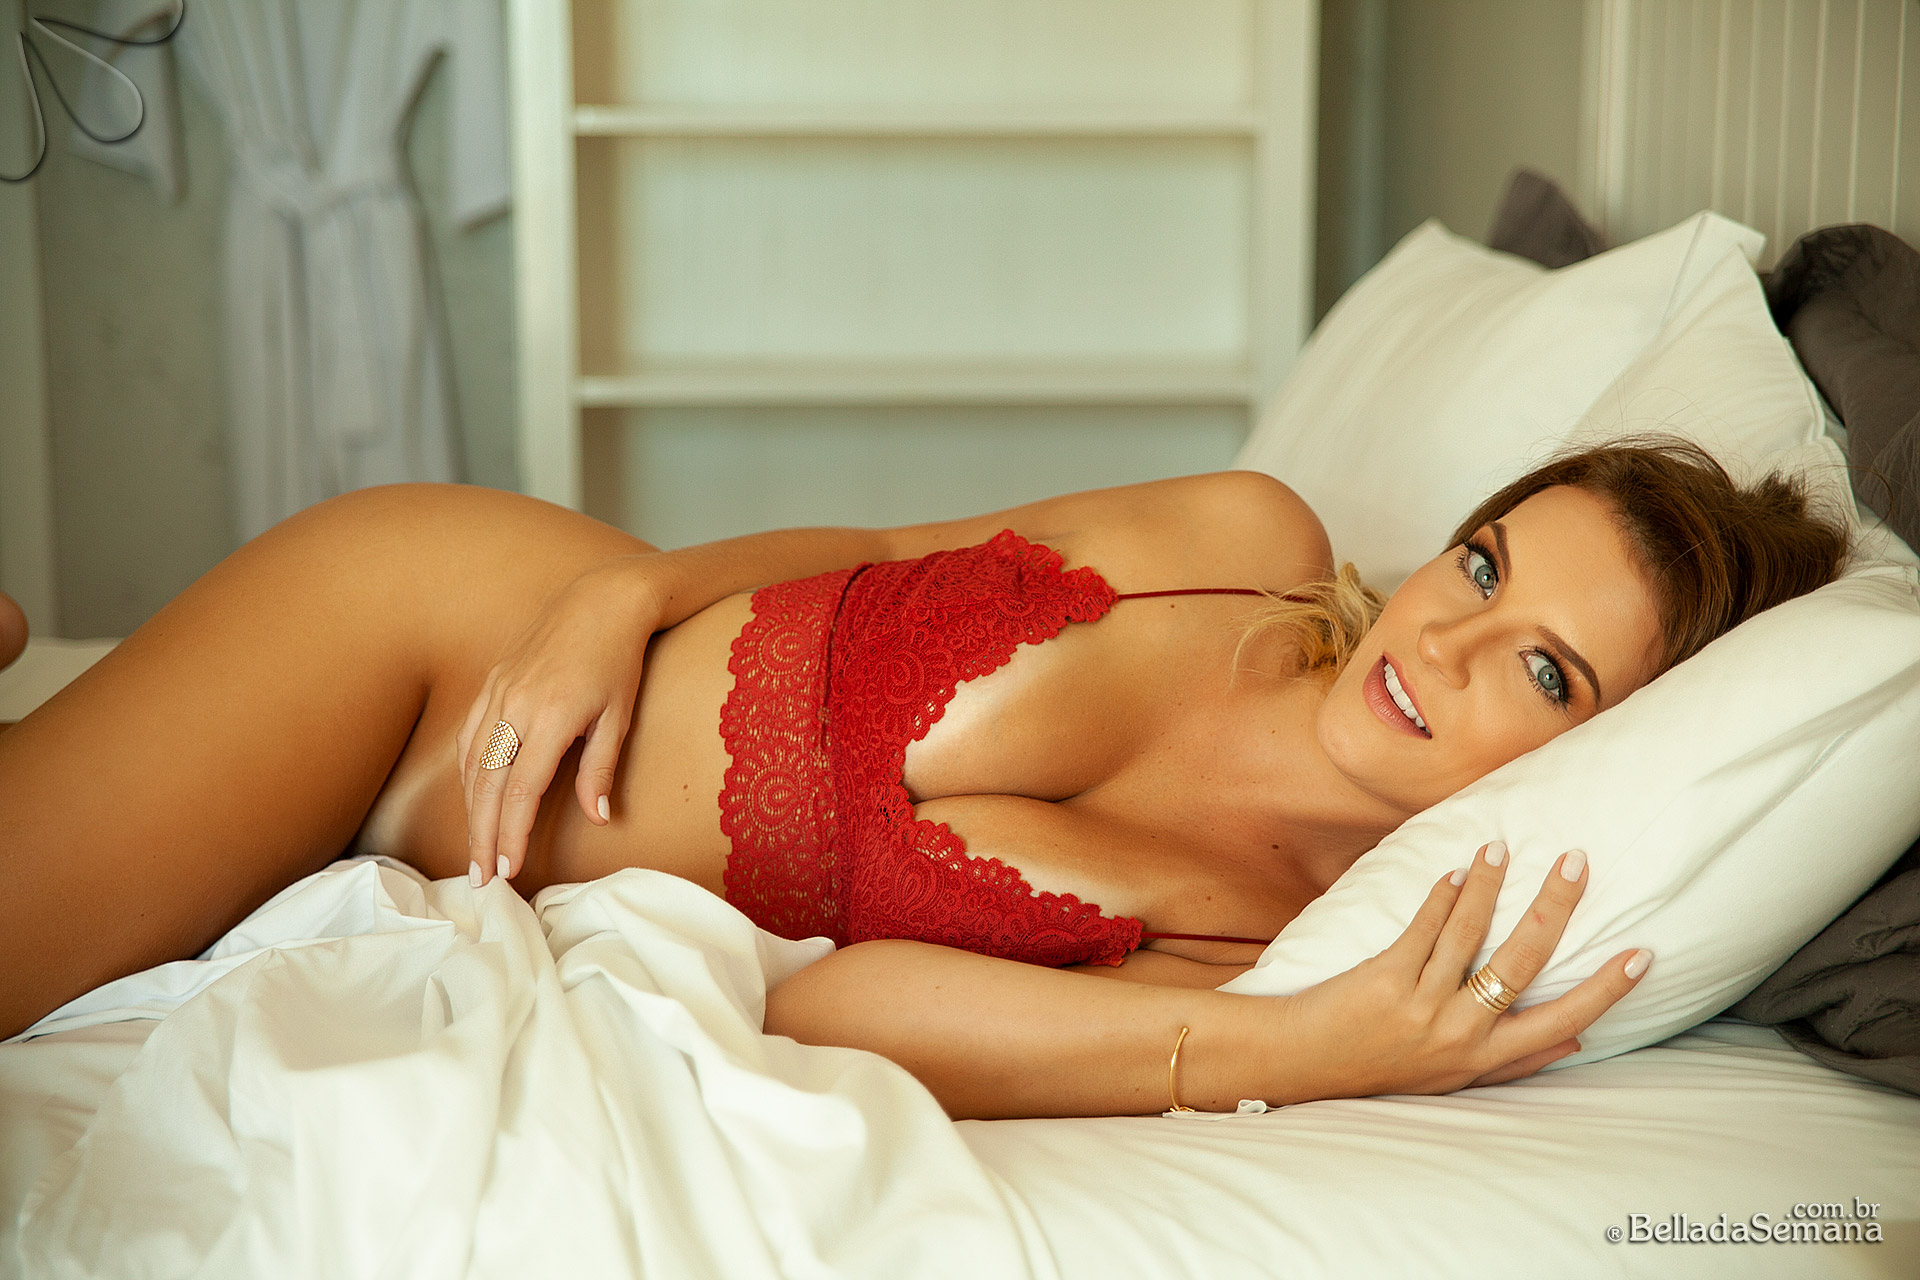 Patricia Hollweg